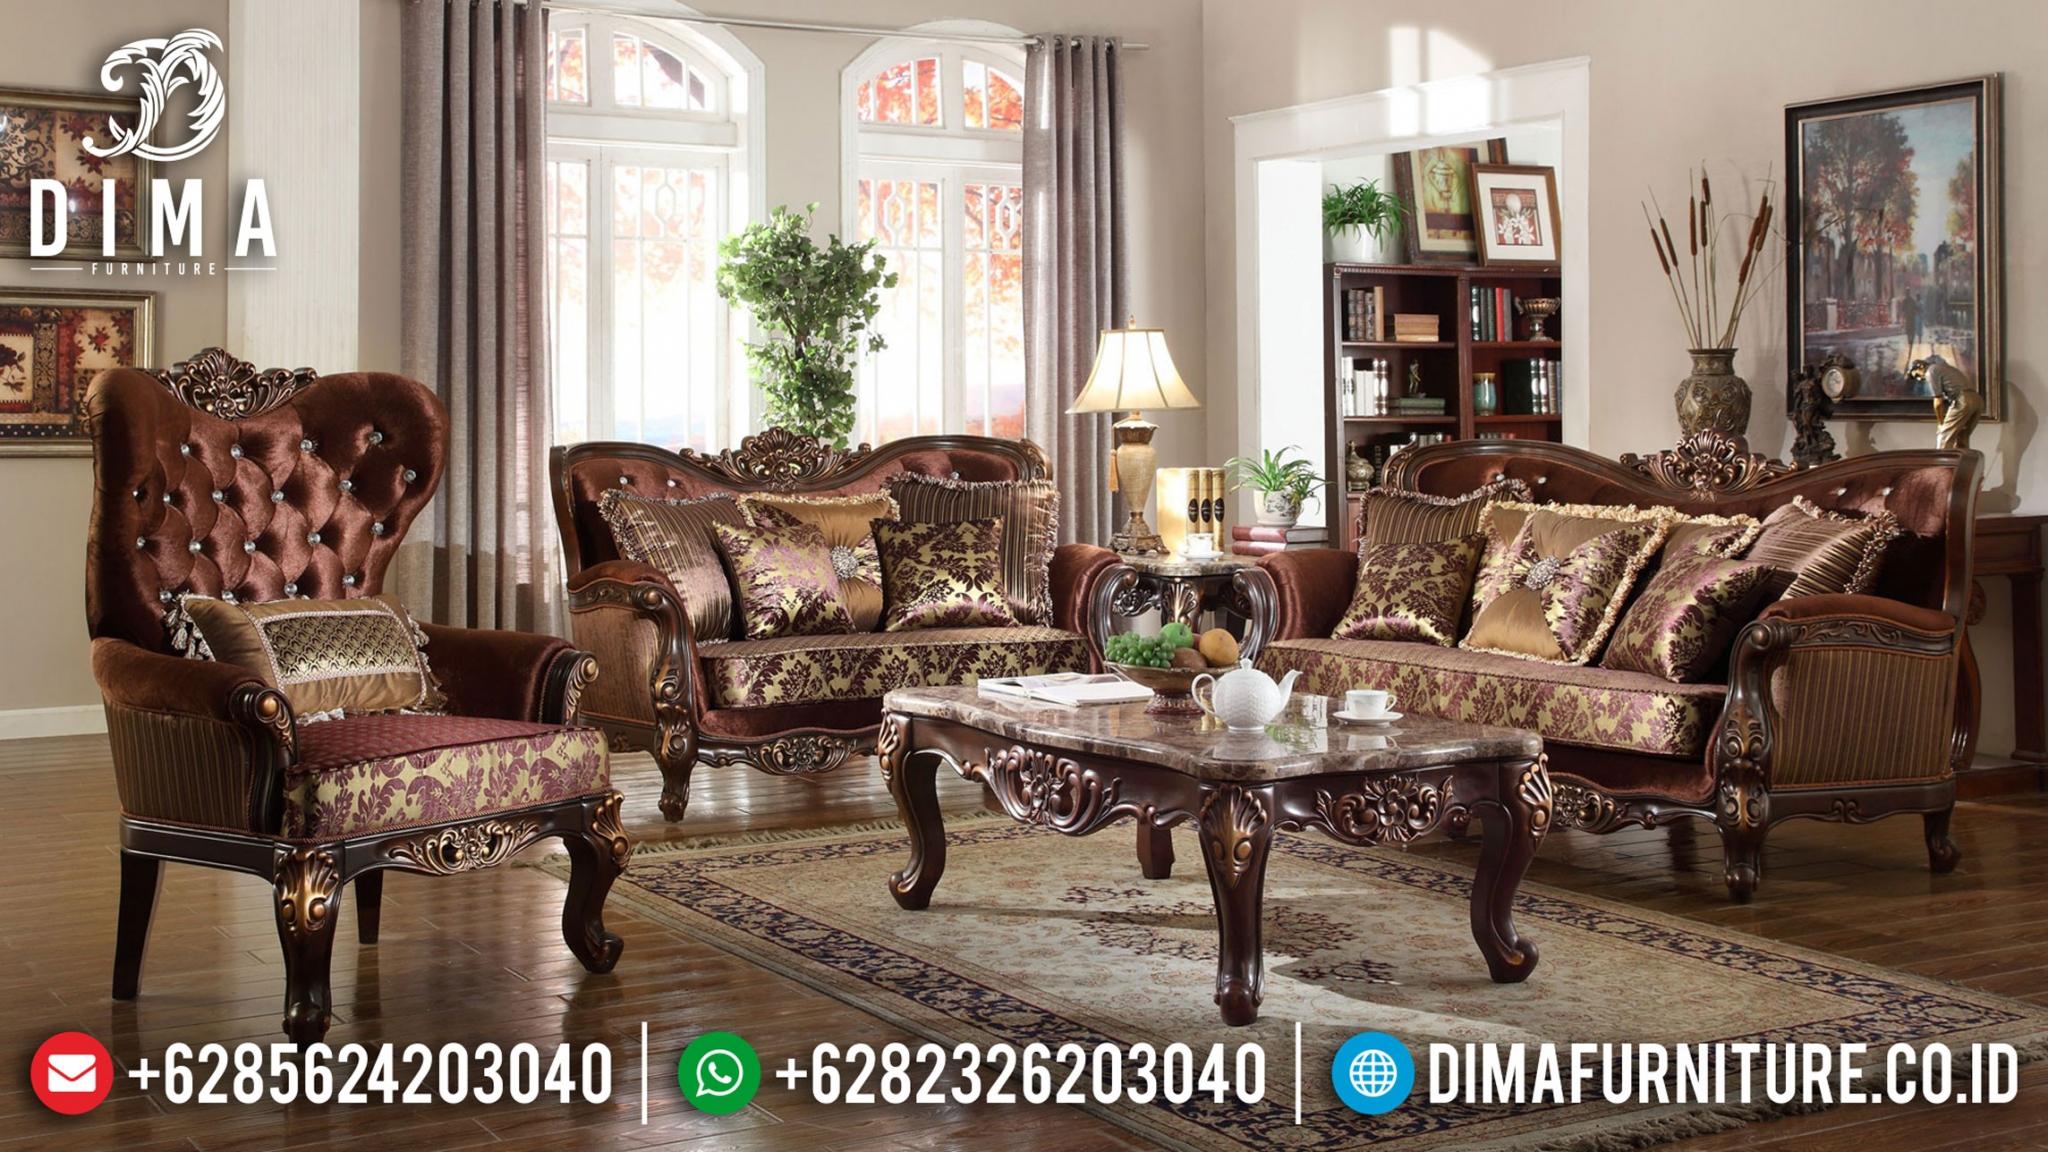 Kamasean Sofa Tamu Mewah Natural Combine Luxury Style Best Price BT-0857